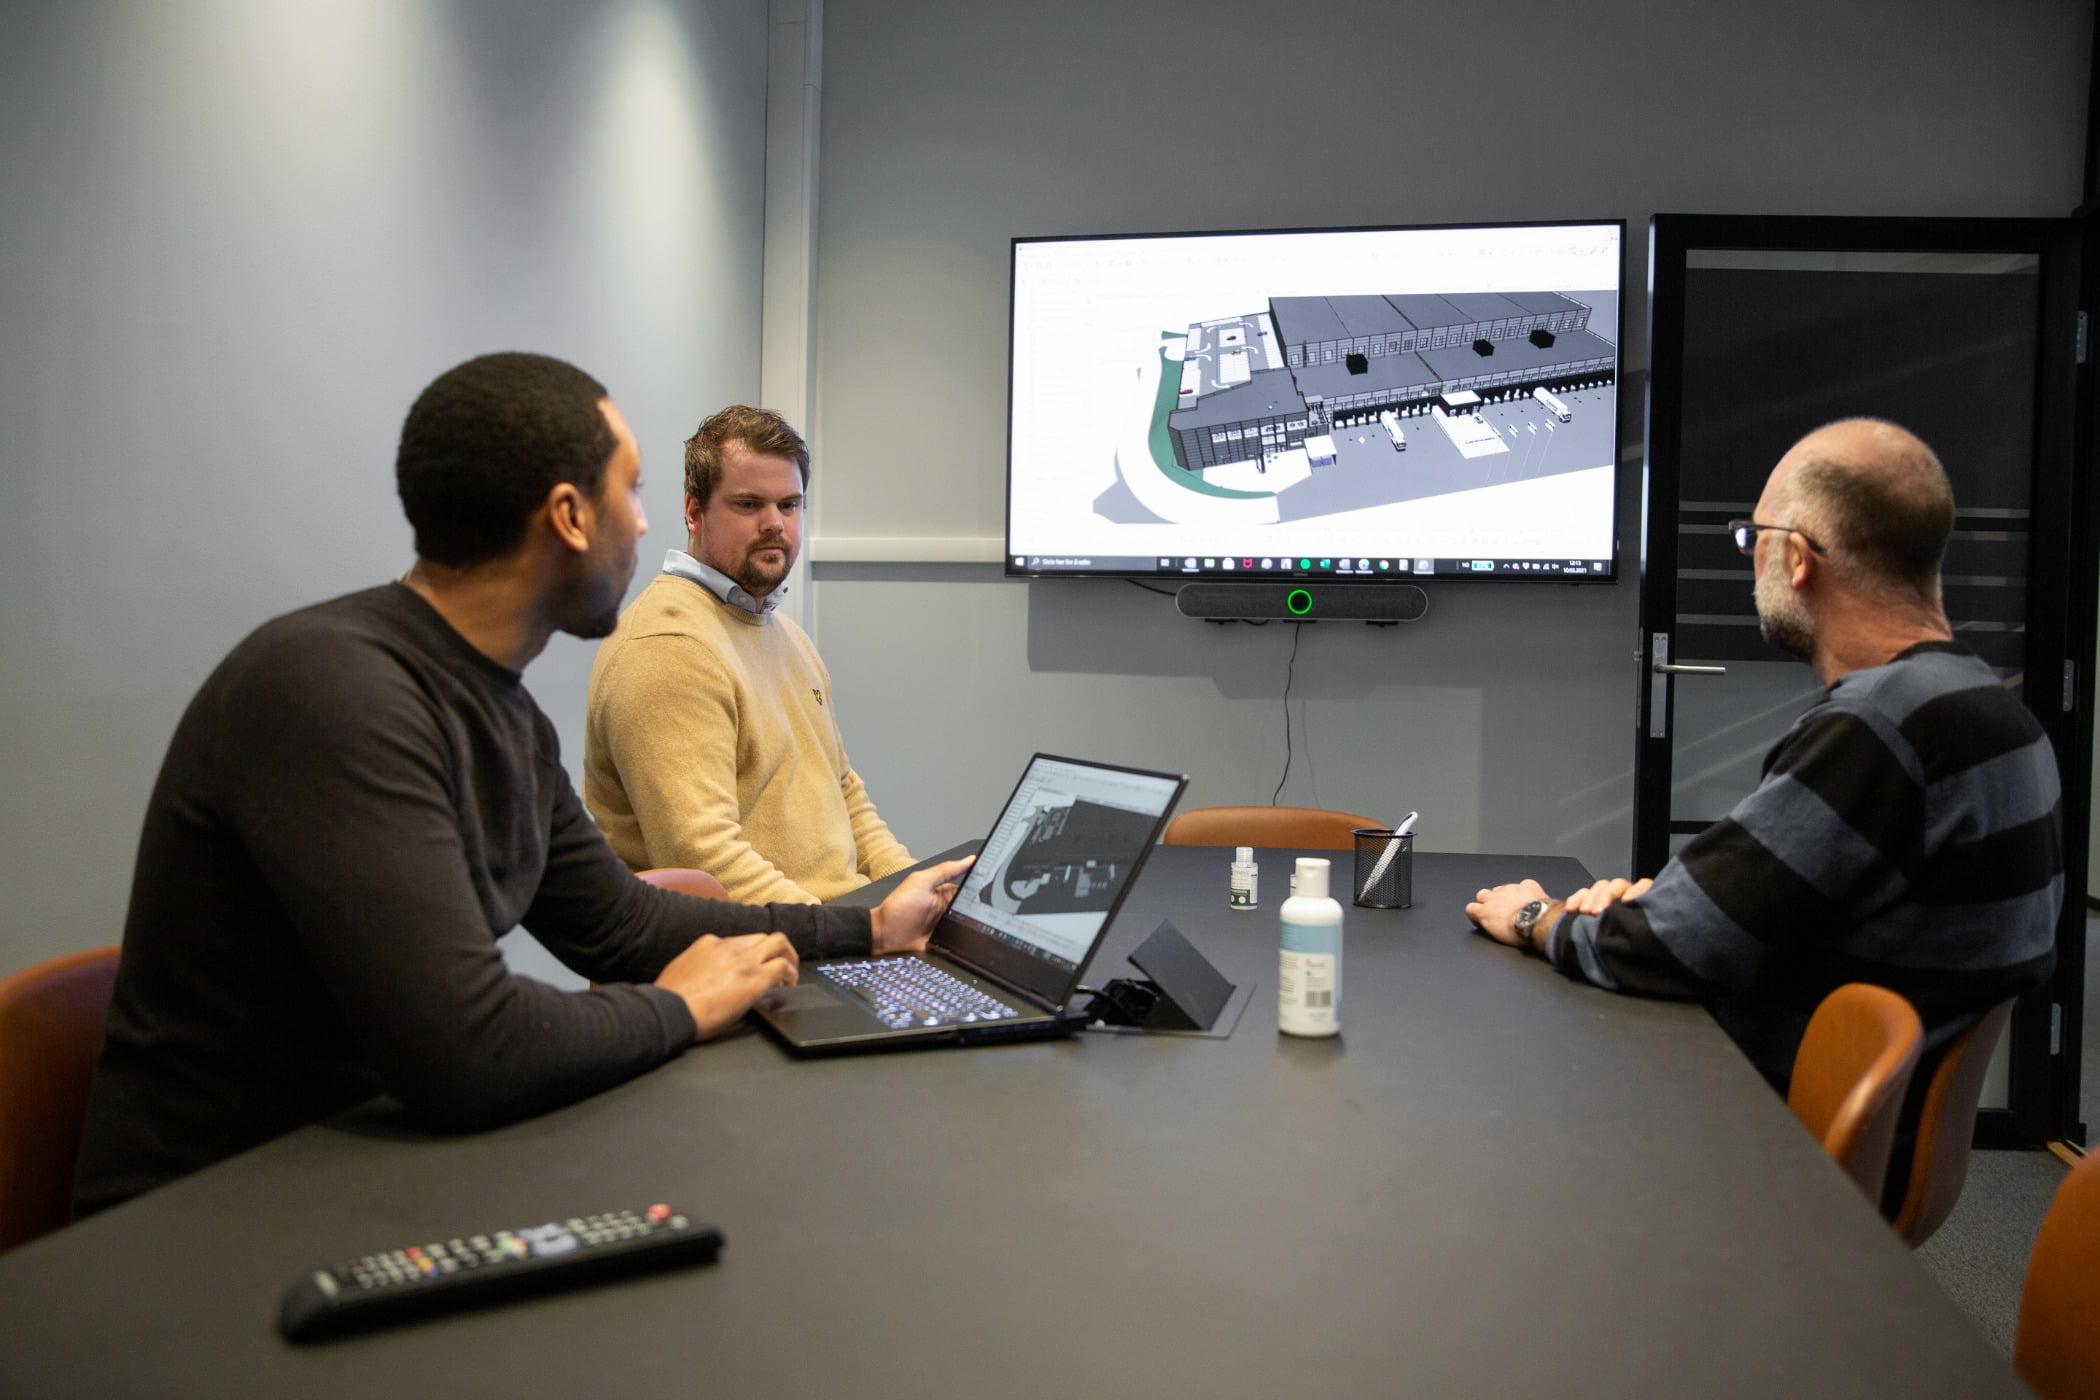 Conference room table, Personal computer, Automotive design, Communication Device, Furniture, Laptop, Desk, Gadget